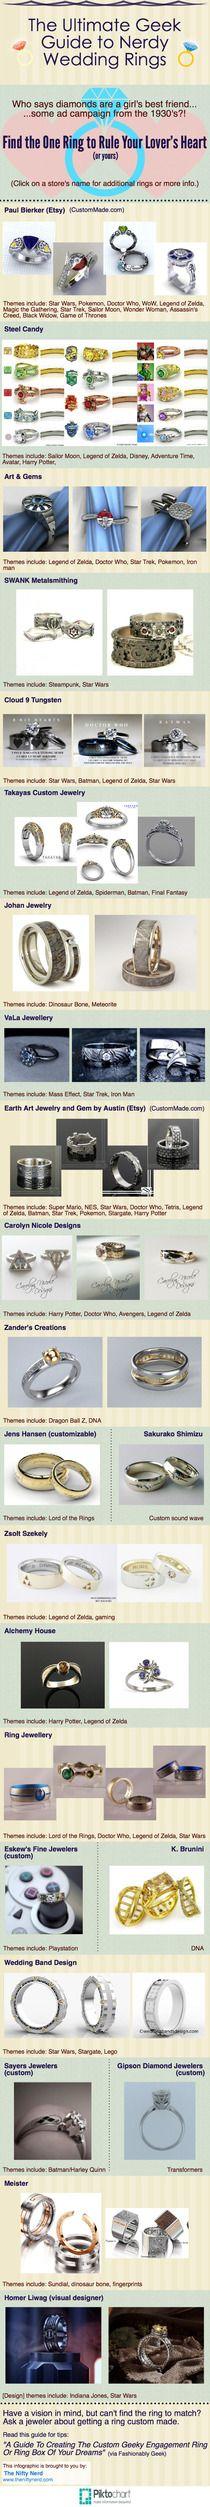 Geek Wedding Ring Guide | Piktochart Infographic Editor